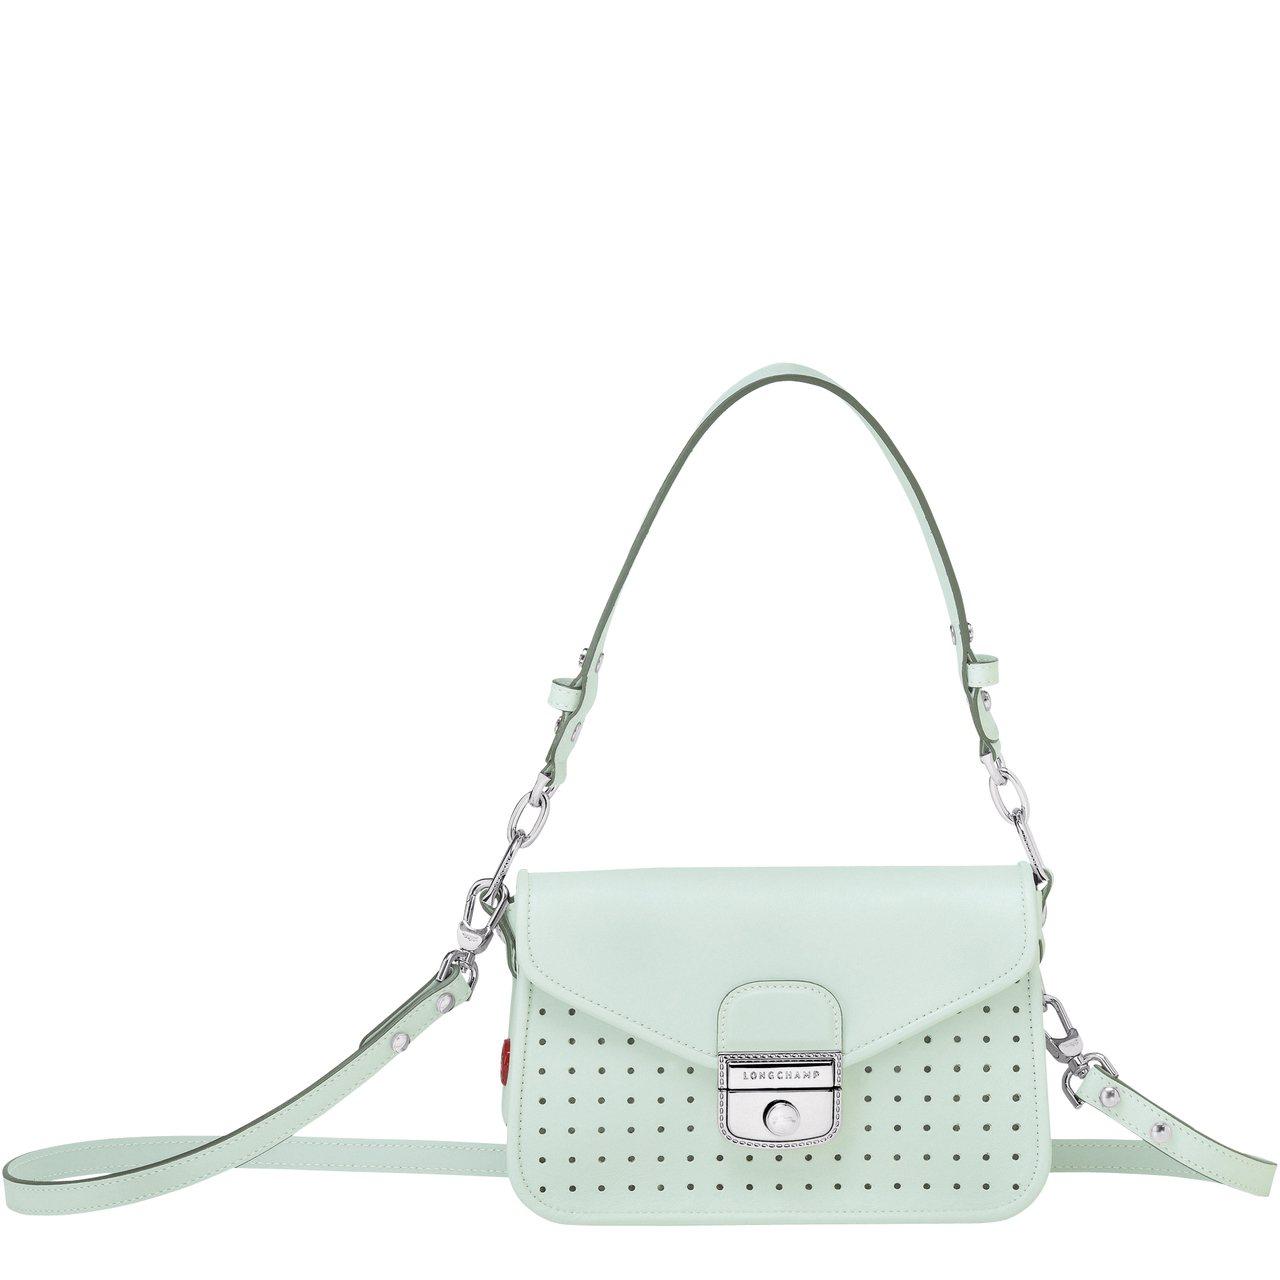 Mademoiselle LONGCHAMP青瓷色斜背包,售價35,300元。圖...